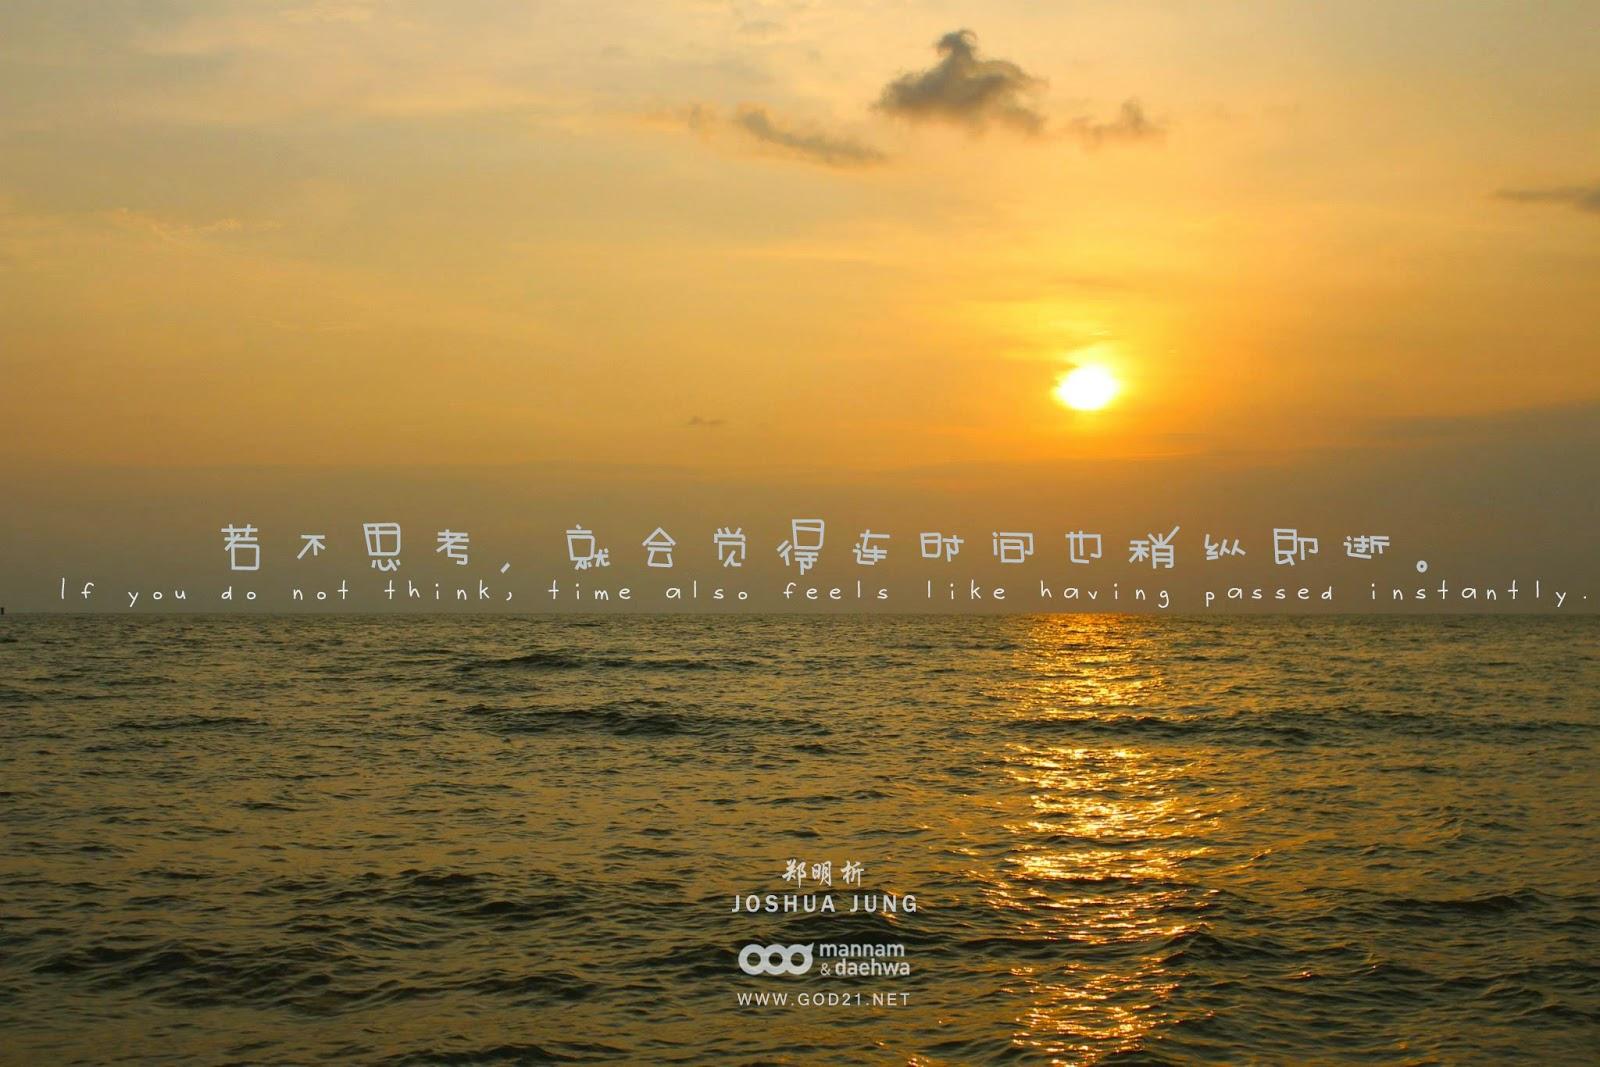 郑明析,摄理教会,月明洞,夕阳,天空,海,思考,时间,Joshua Jung, Providence, Wolmyeung Dong, sunset, sky, sea, think, time